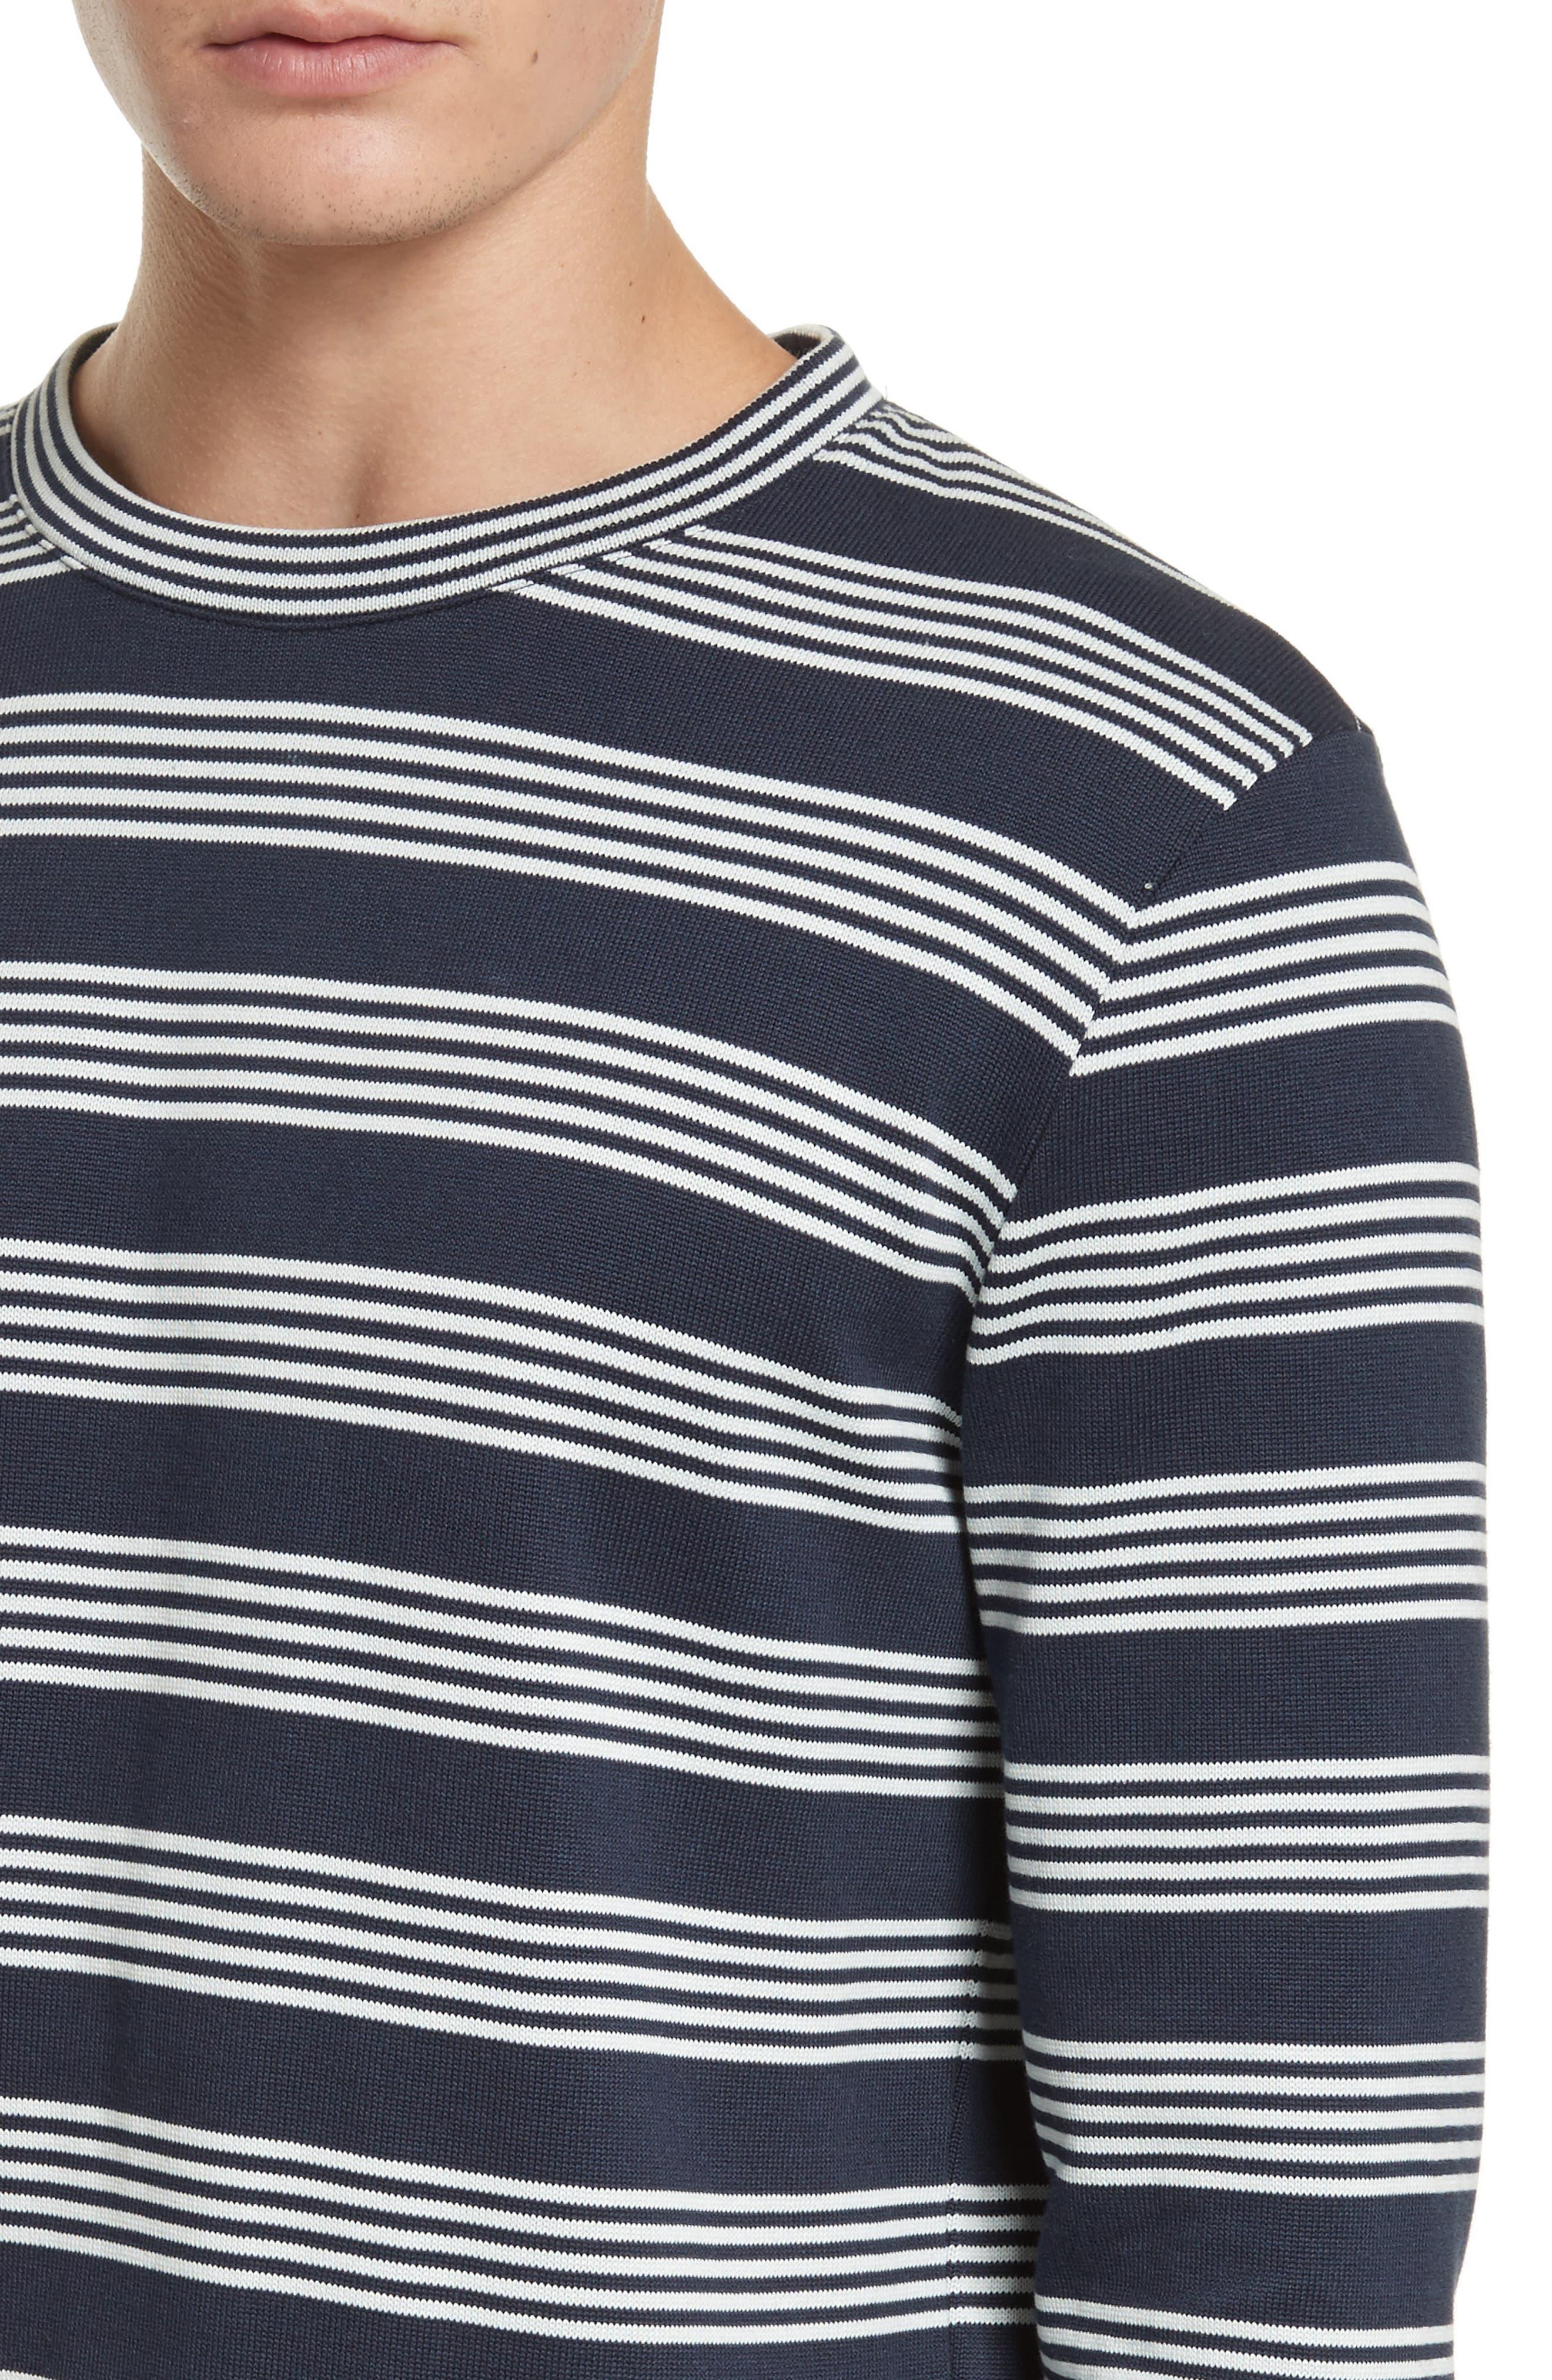 Stripe Sweat Jeremie Sweater,                             Alternate thumbnail 4, color,                             410